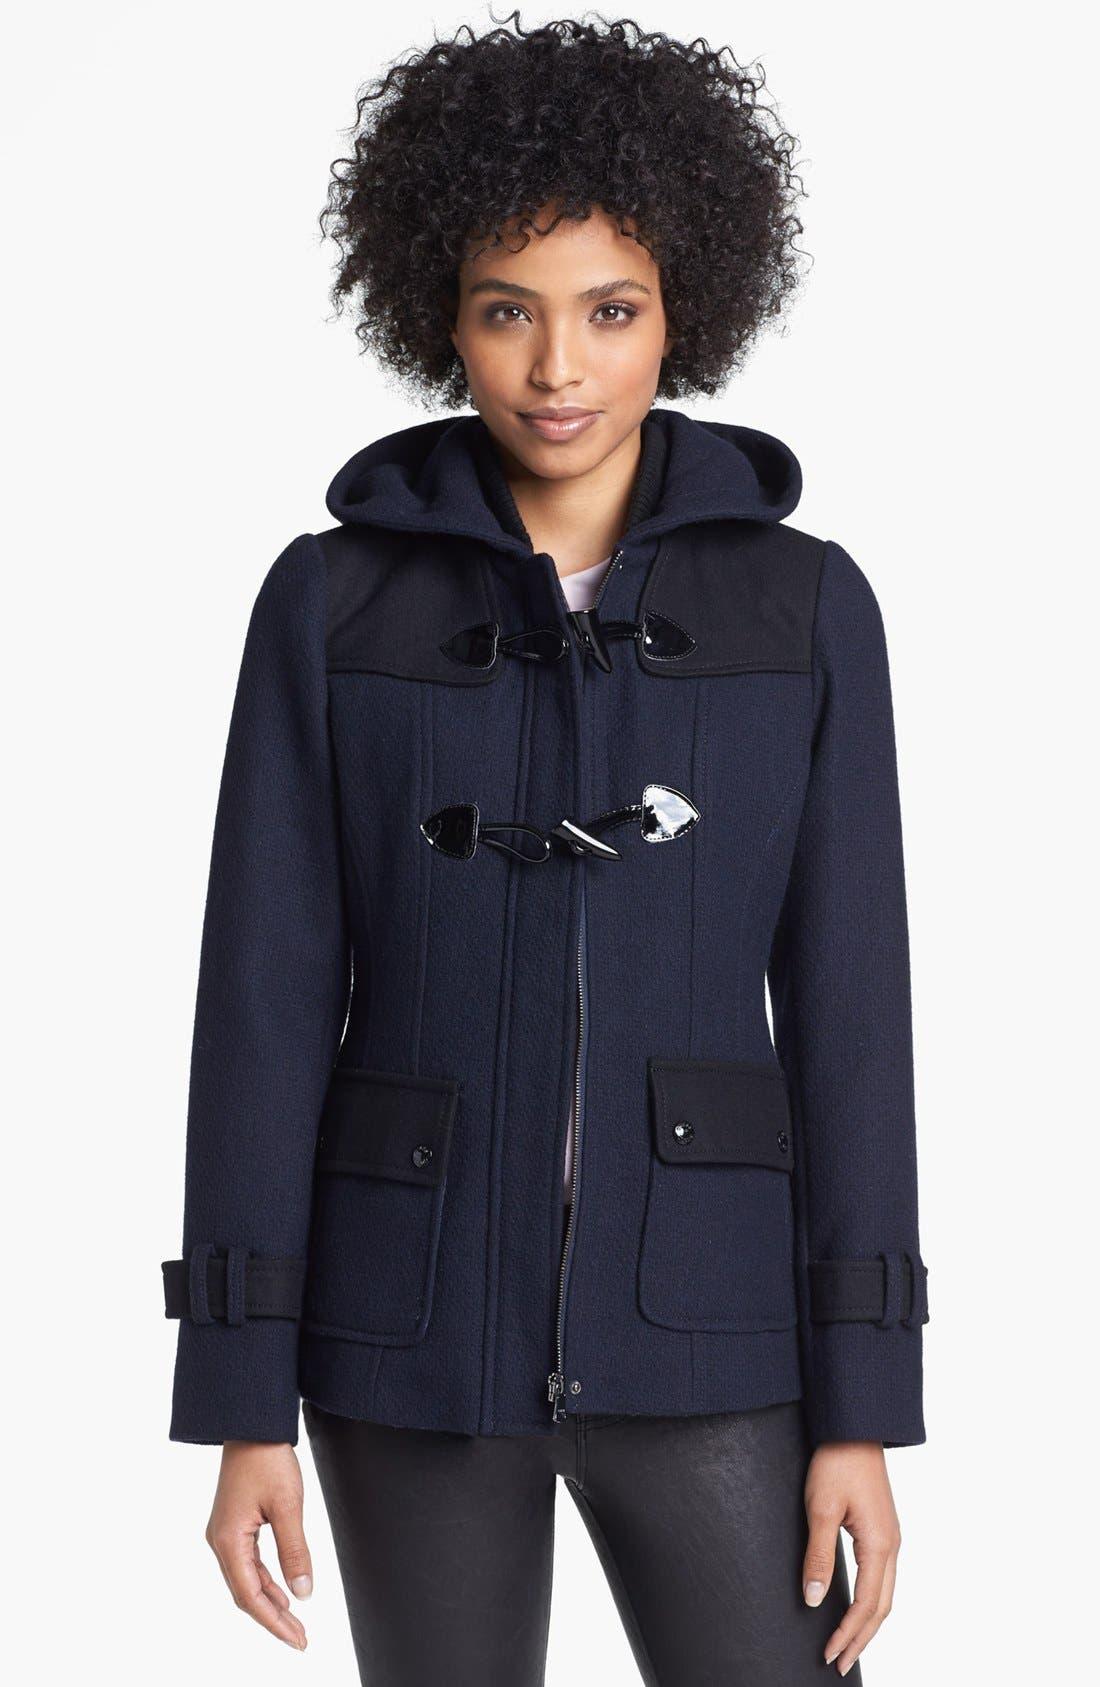 Alternate Image 1 Selected - GUESS Colorblock Toggle Duffle Coat